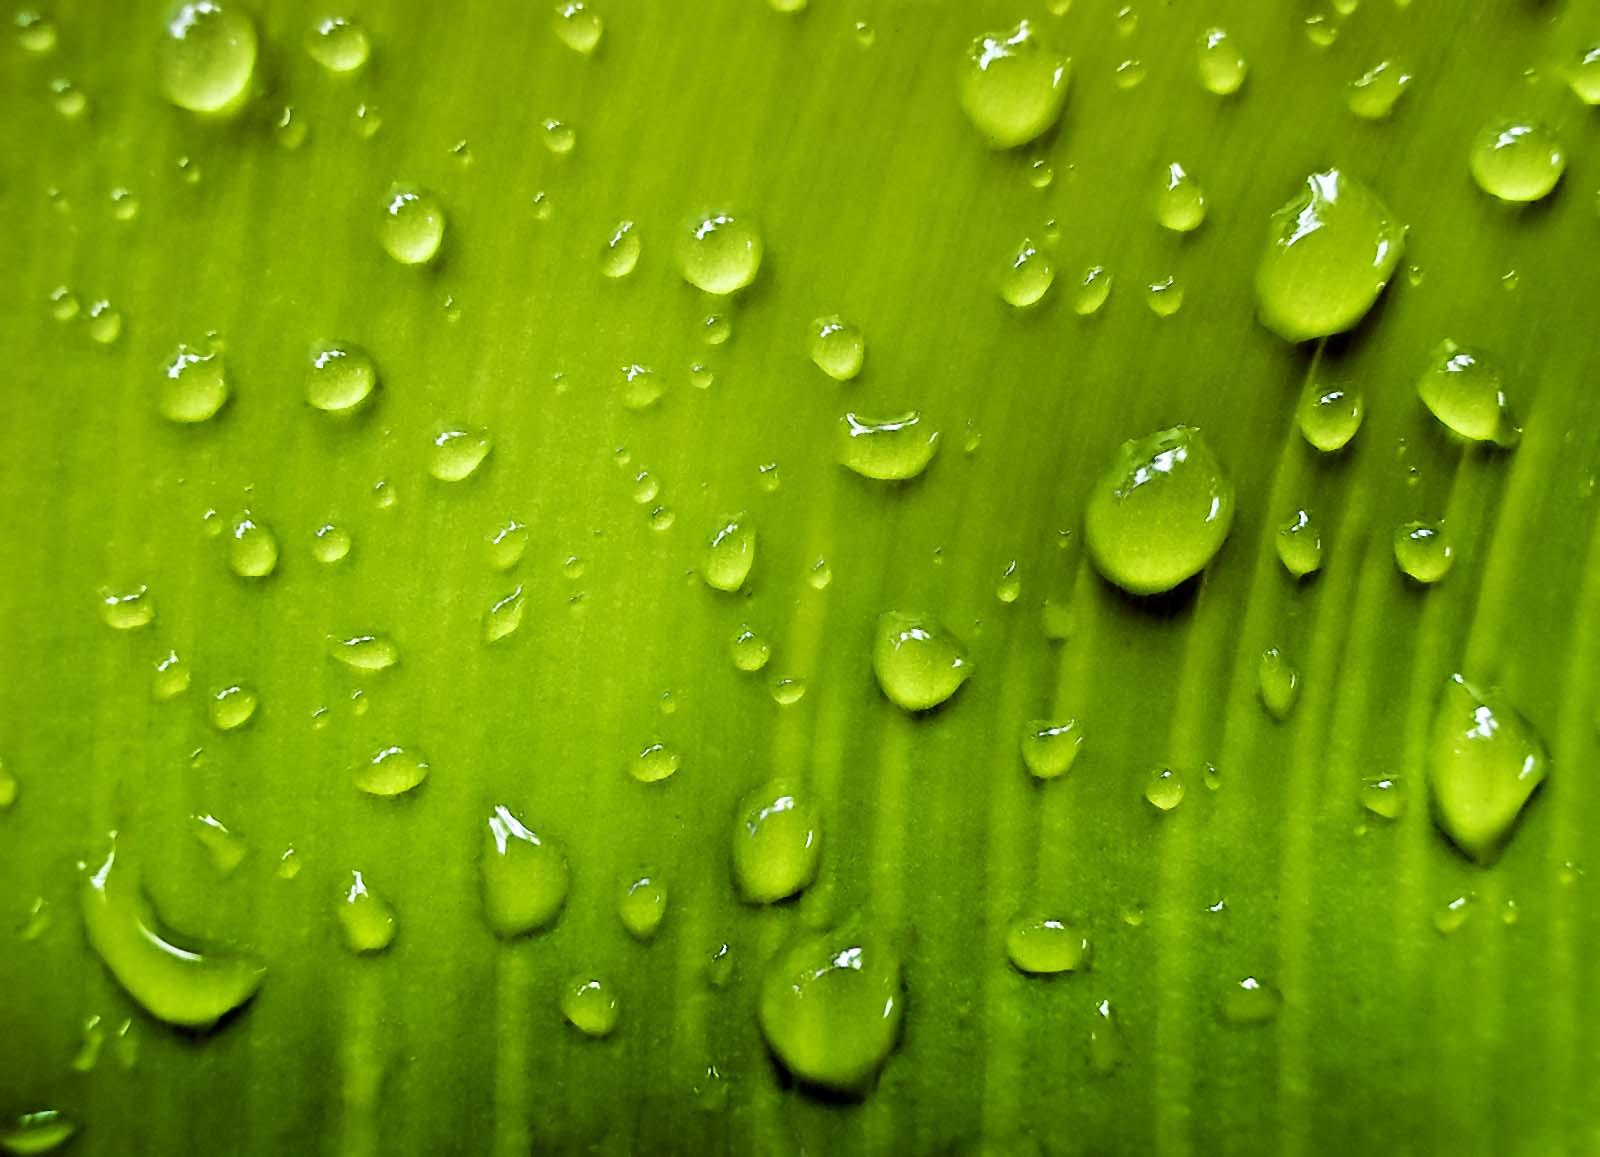 Paint Falling Wallpaper Imazes Water Drop